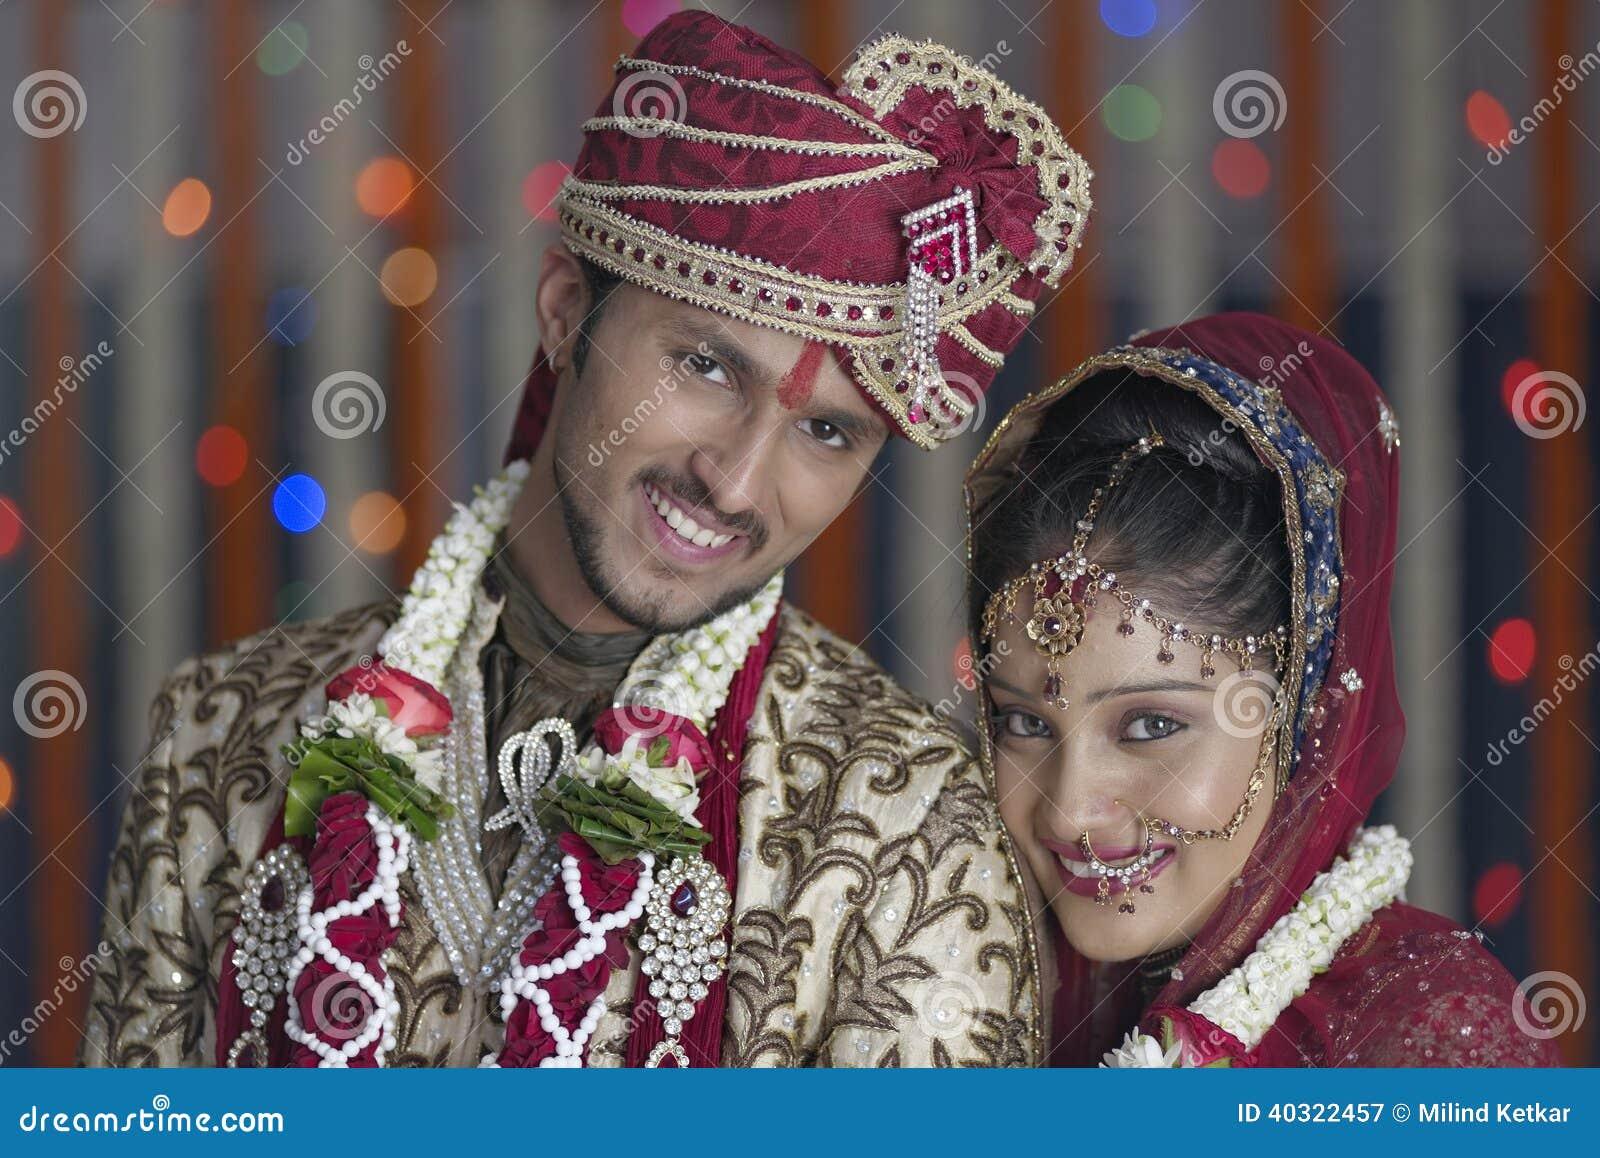 Indian Hindu Bride & Groom a happy smiling couple.